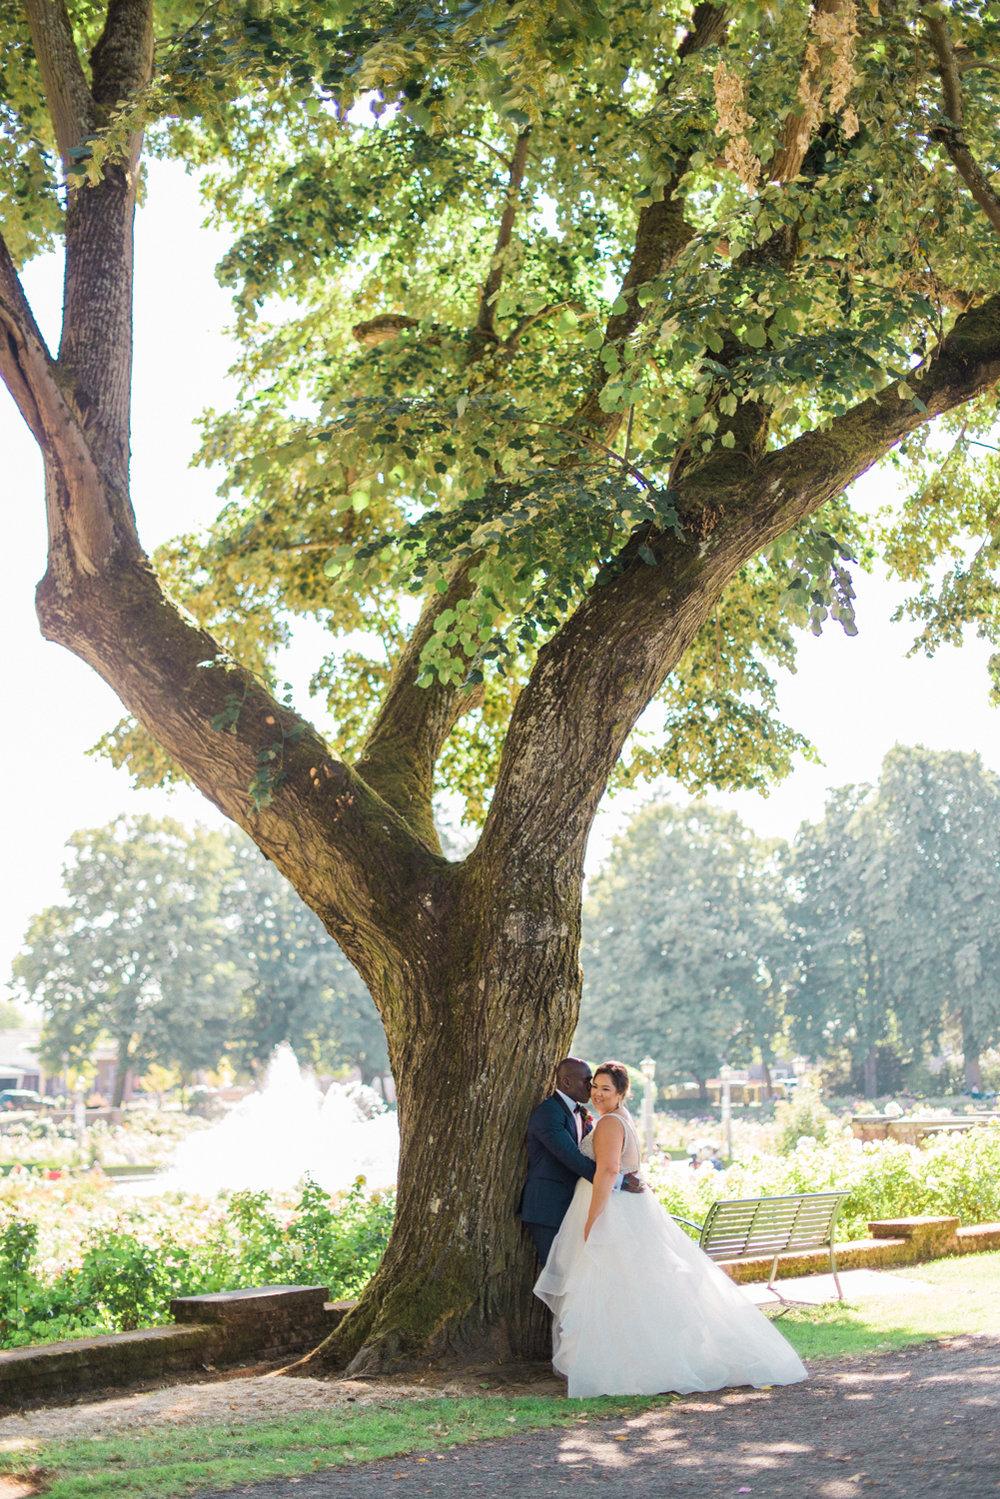 peninsula-park-rose-garden-portland-wedding-shelley-marie-photo-2.jpg